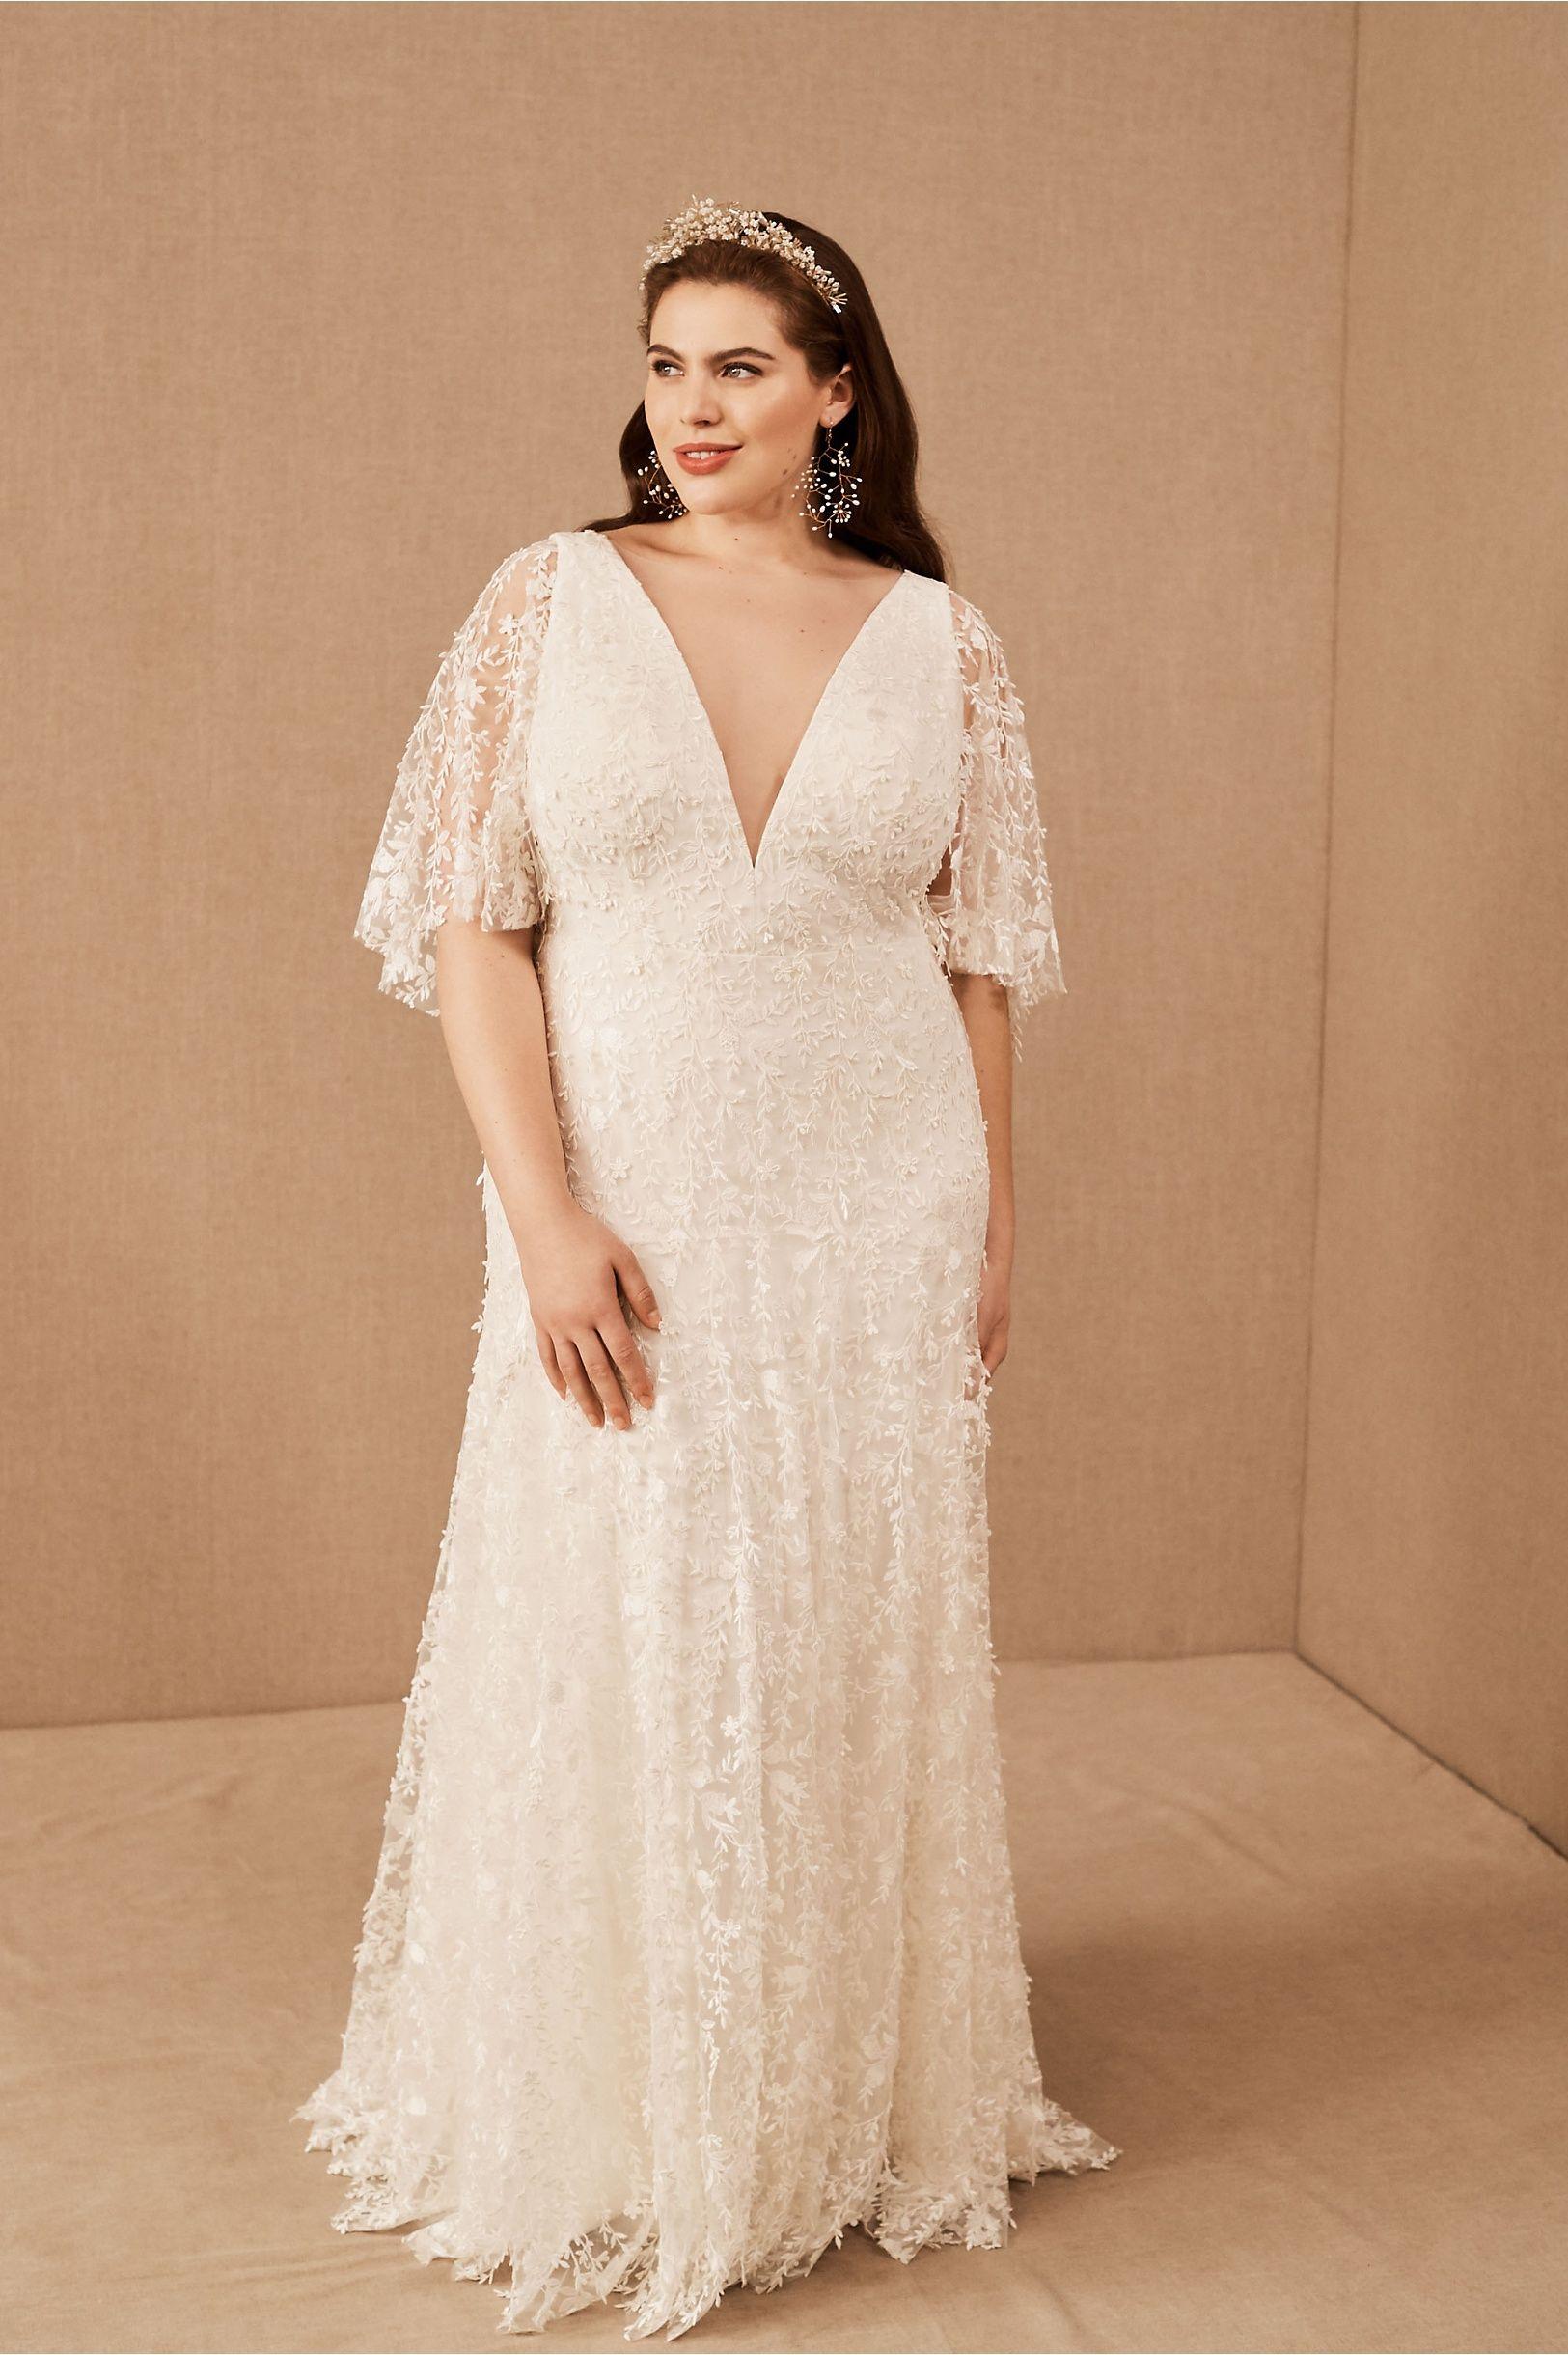 Jenny By Jenny Yoo Lourdes Gown In 2020 Flattering Wedding Dress Plus Size Wedding Gowns Wedding Dresses [ 2440 x 1625 Pixel ]